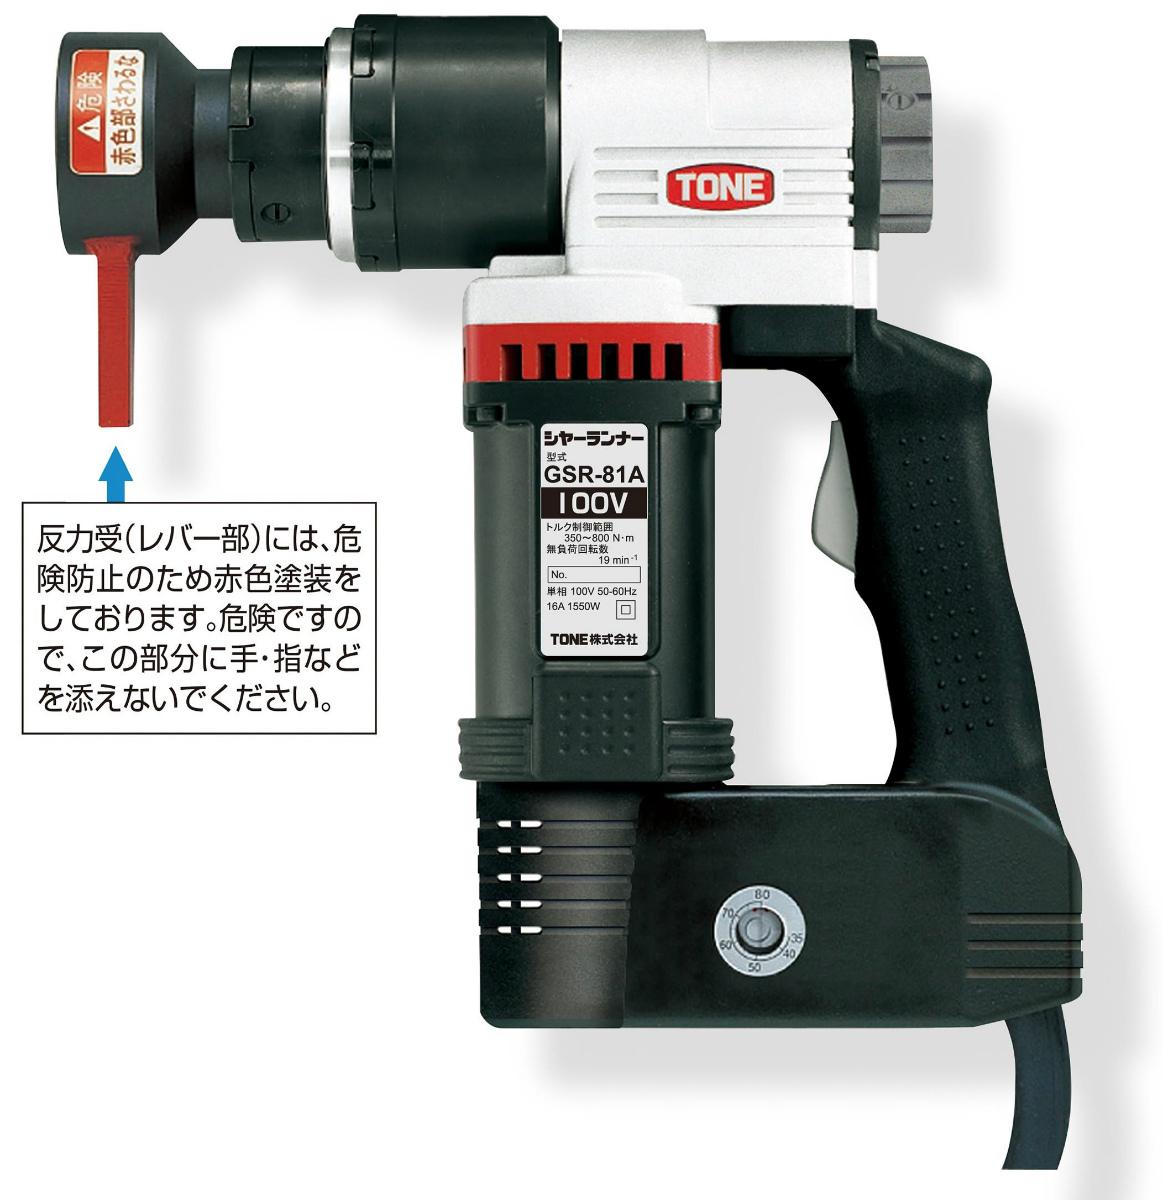 TONE (トネ) シャーランナー【ナットランナー】 GSR81A